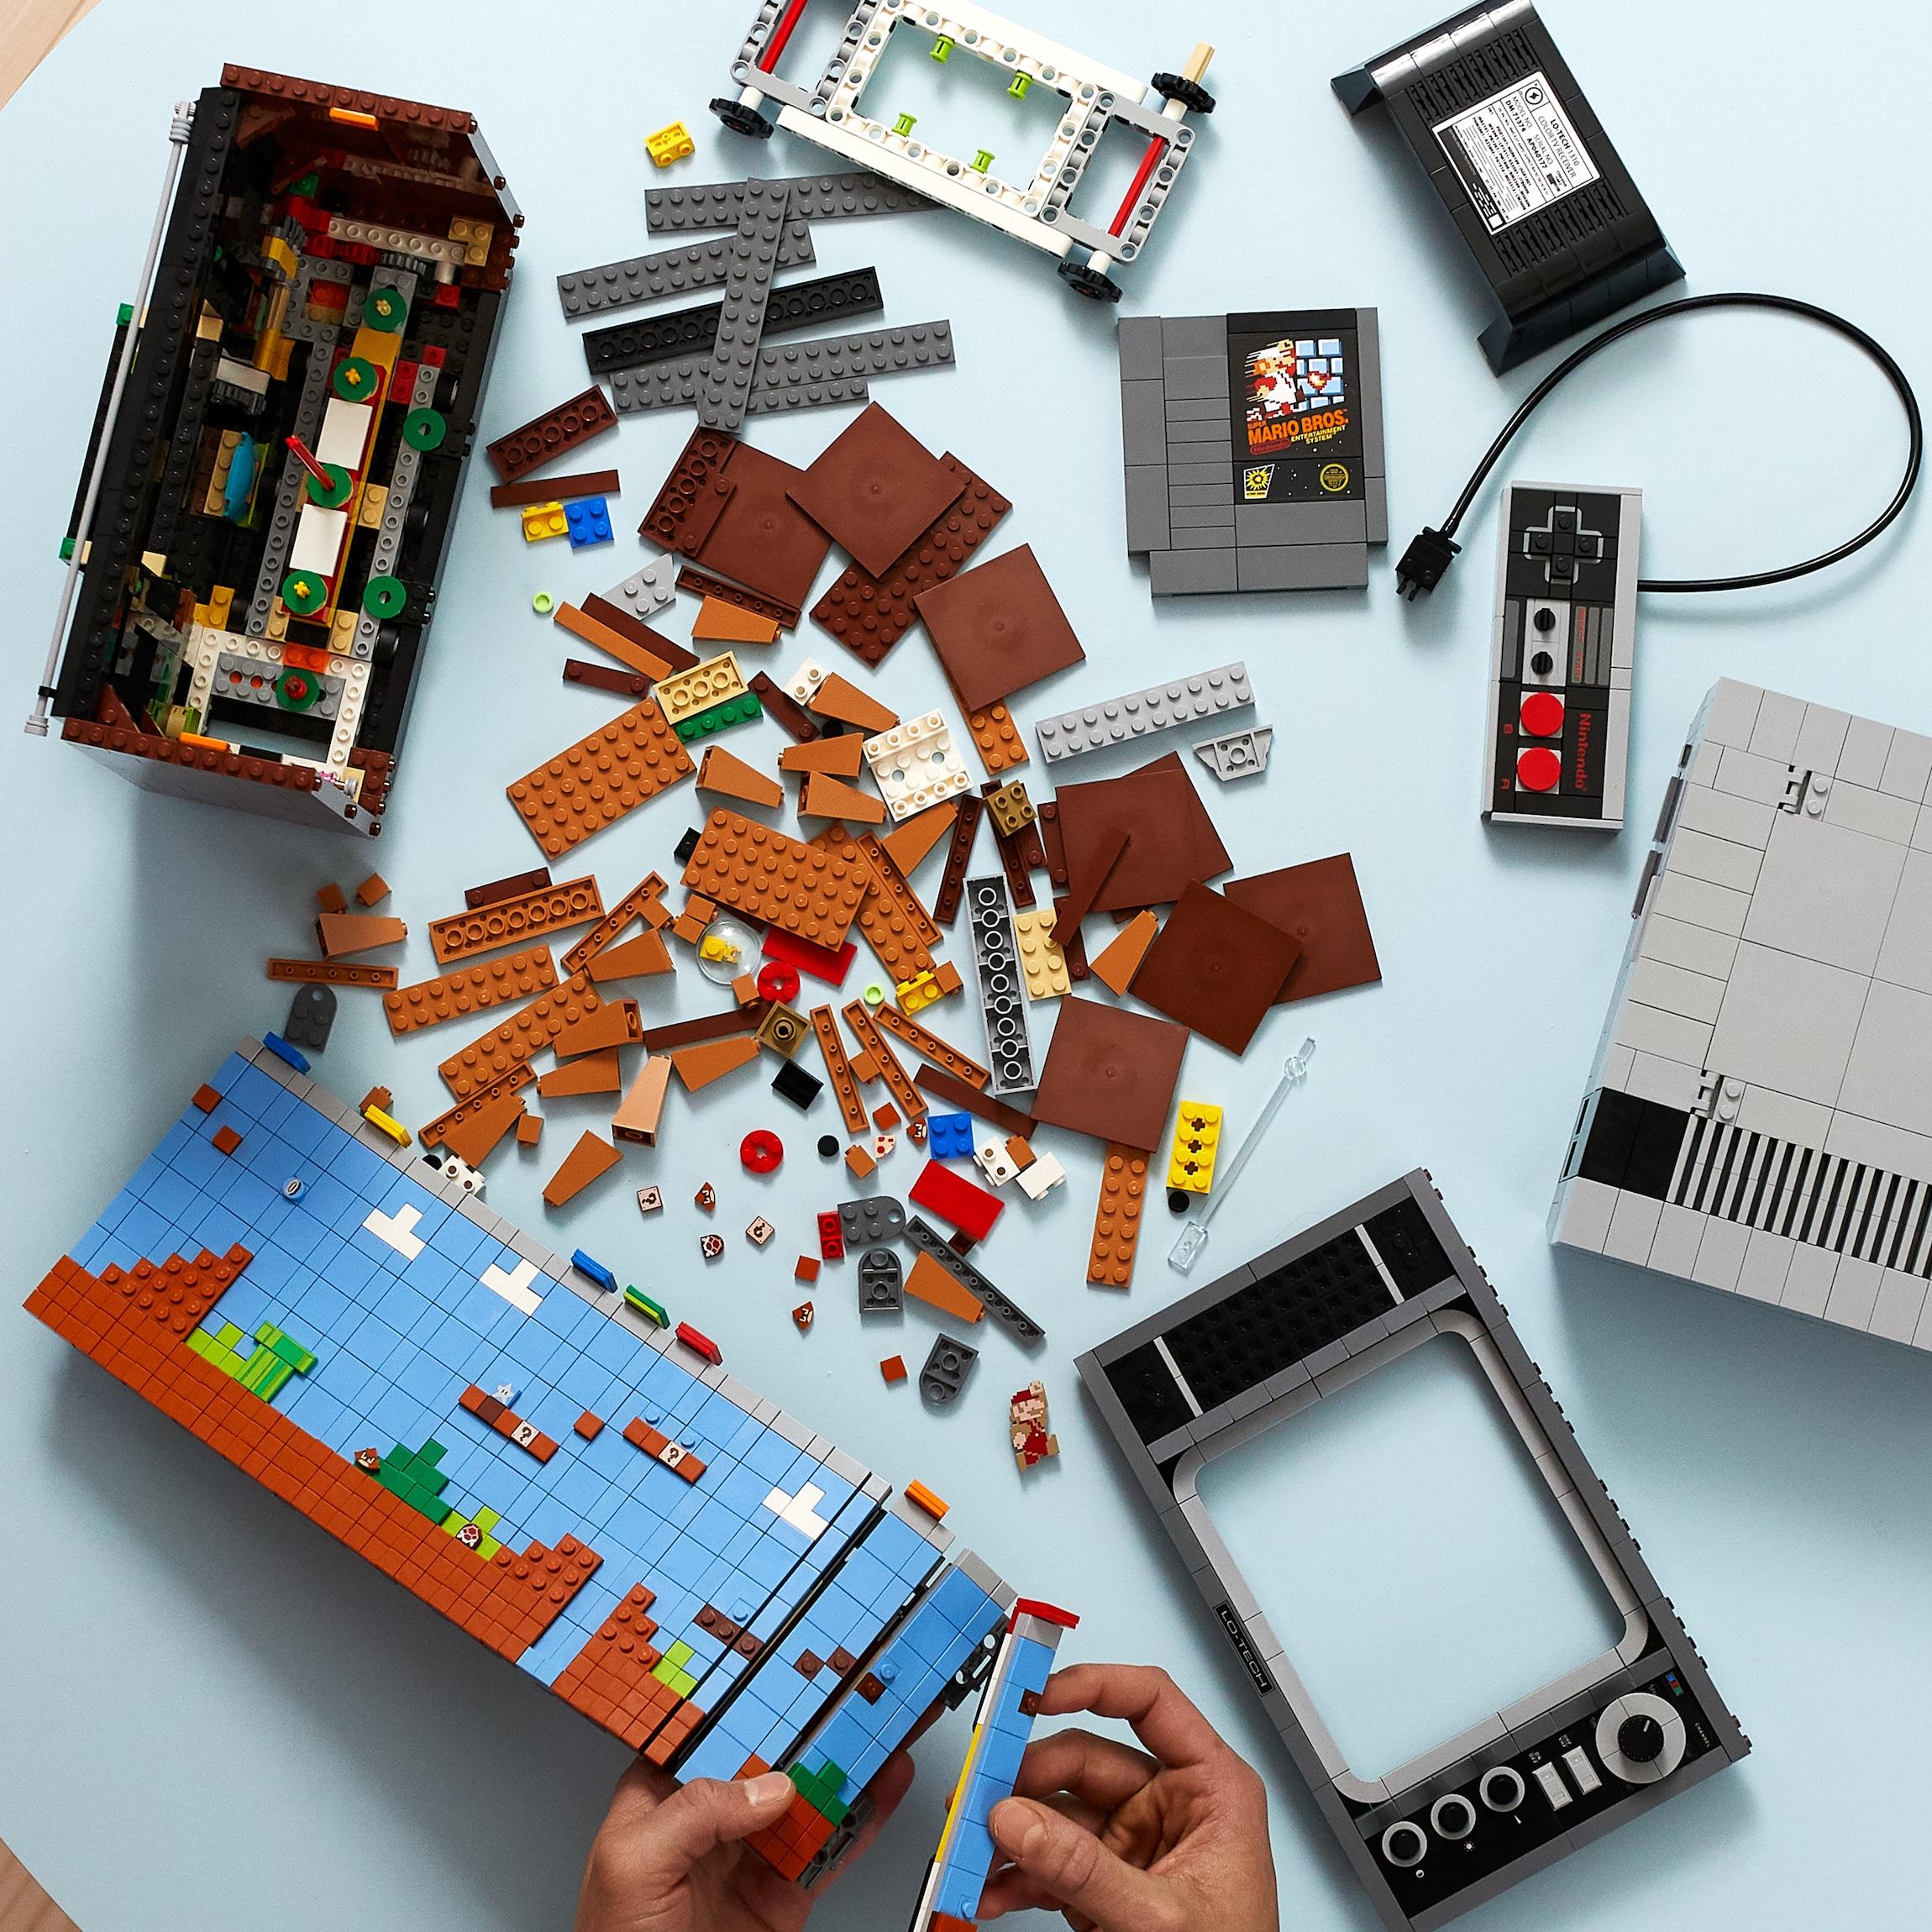 LEGO NES Building Kit is a brilliant reimagining of the original Nintendo console 17